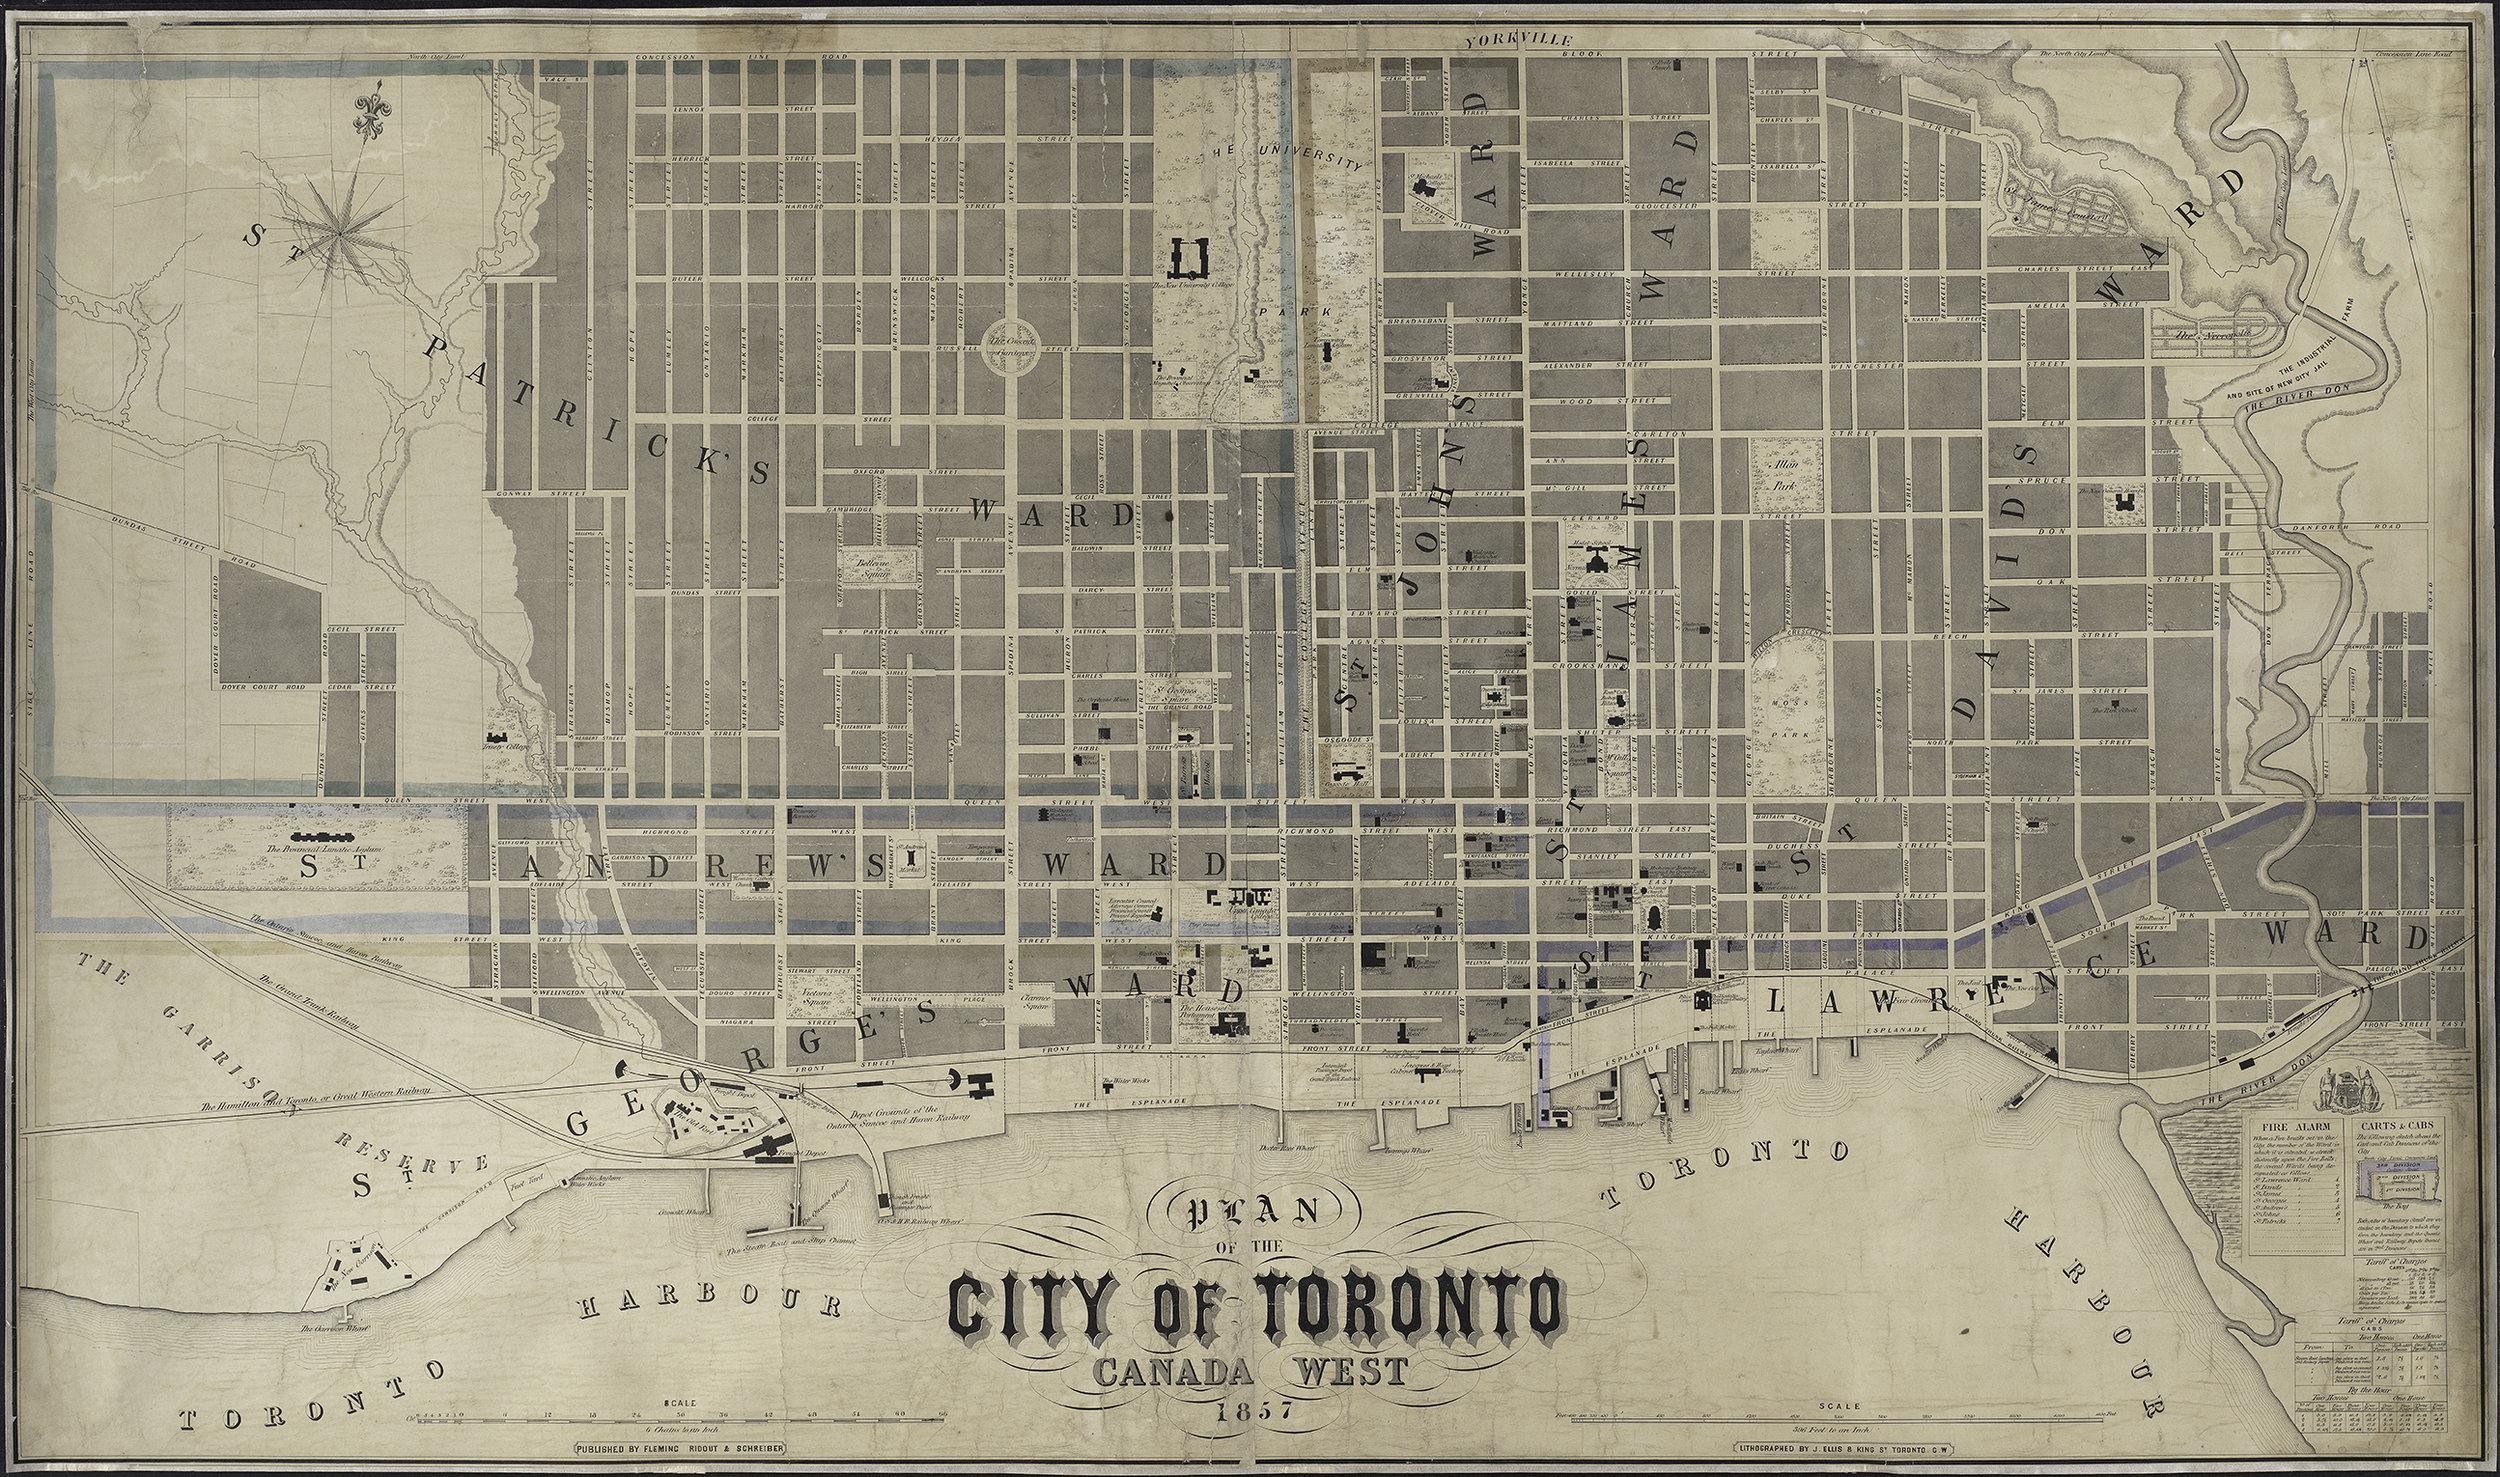 Toronto with Wards 1850s.jpg